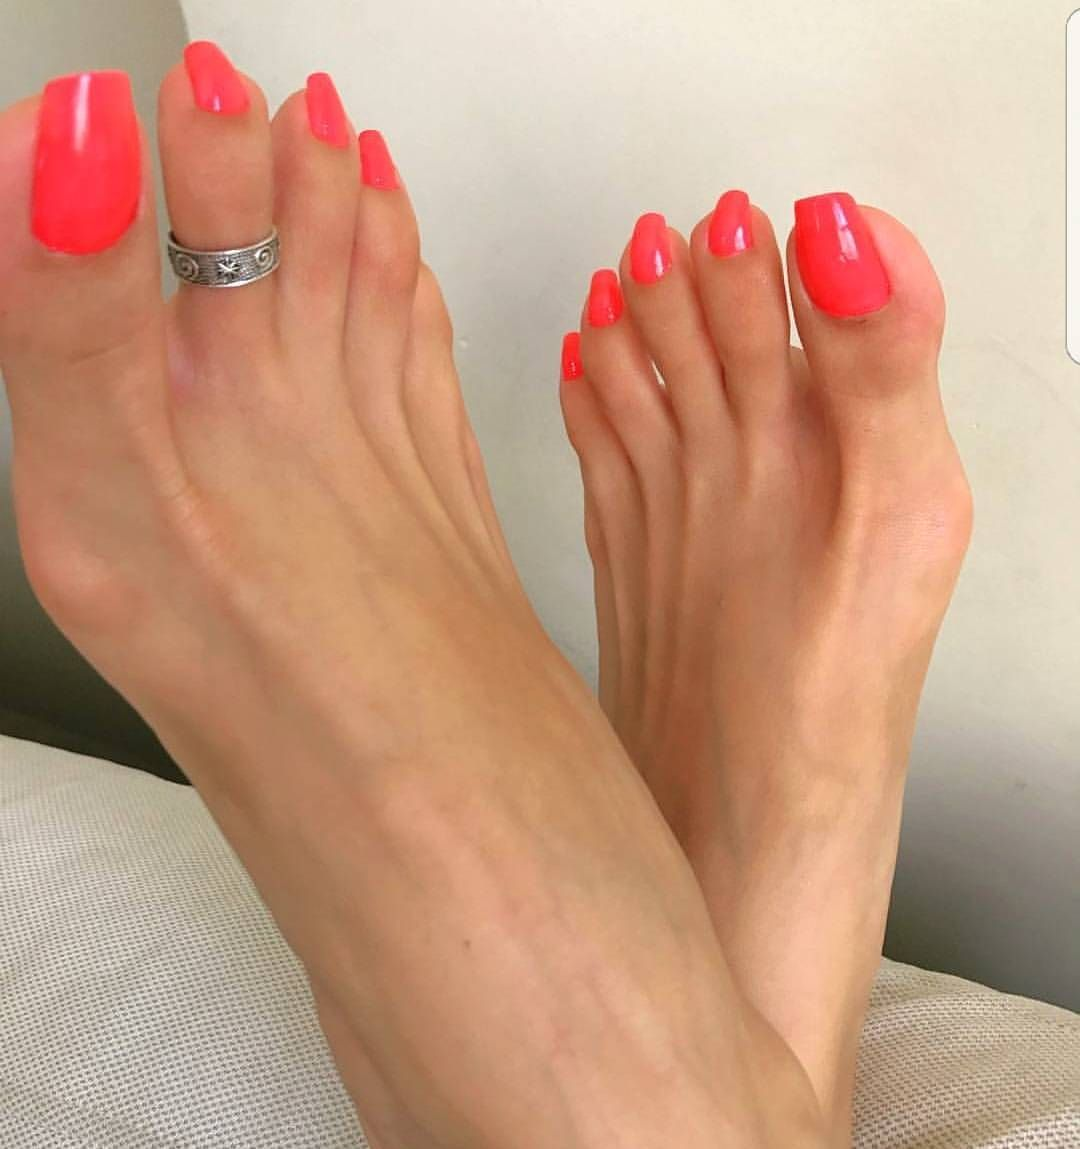 Feet Mimi Gutierrez nudes (32 photos), Ass, Sideboobs, Boobs, cleavage 2018